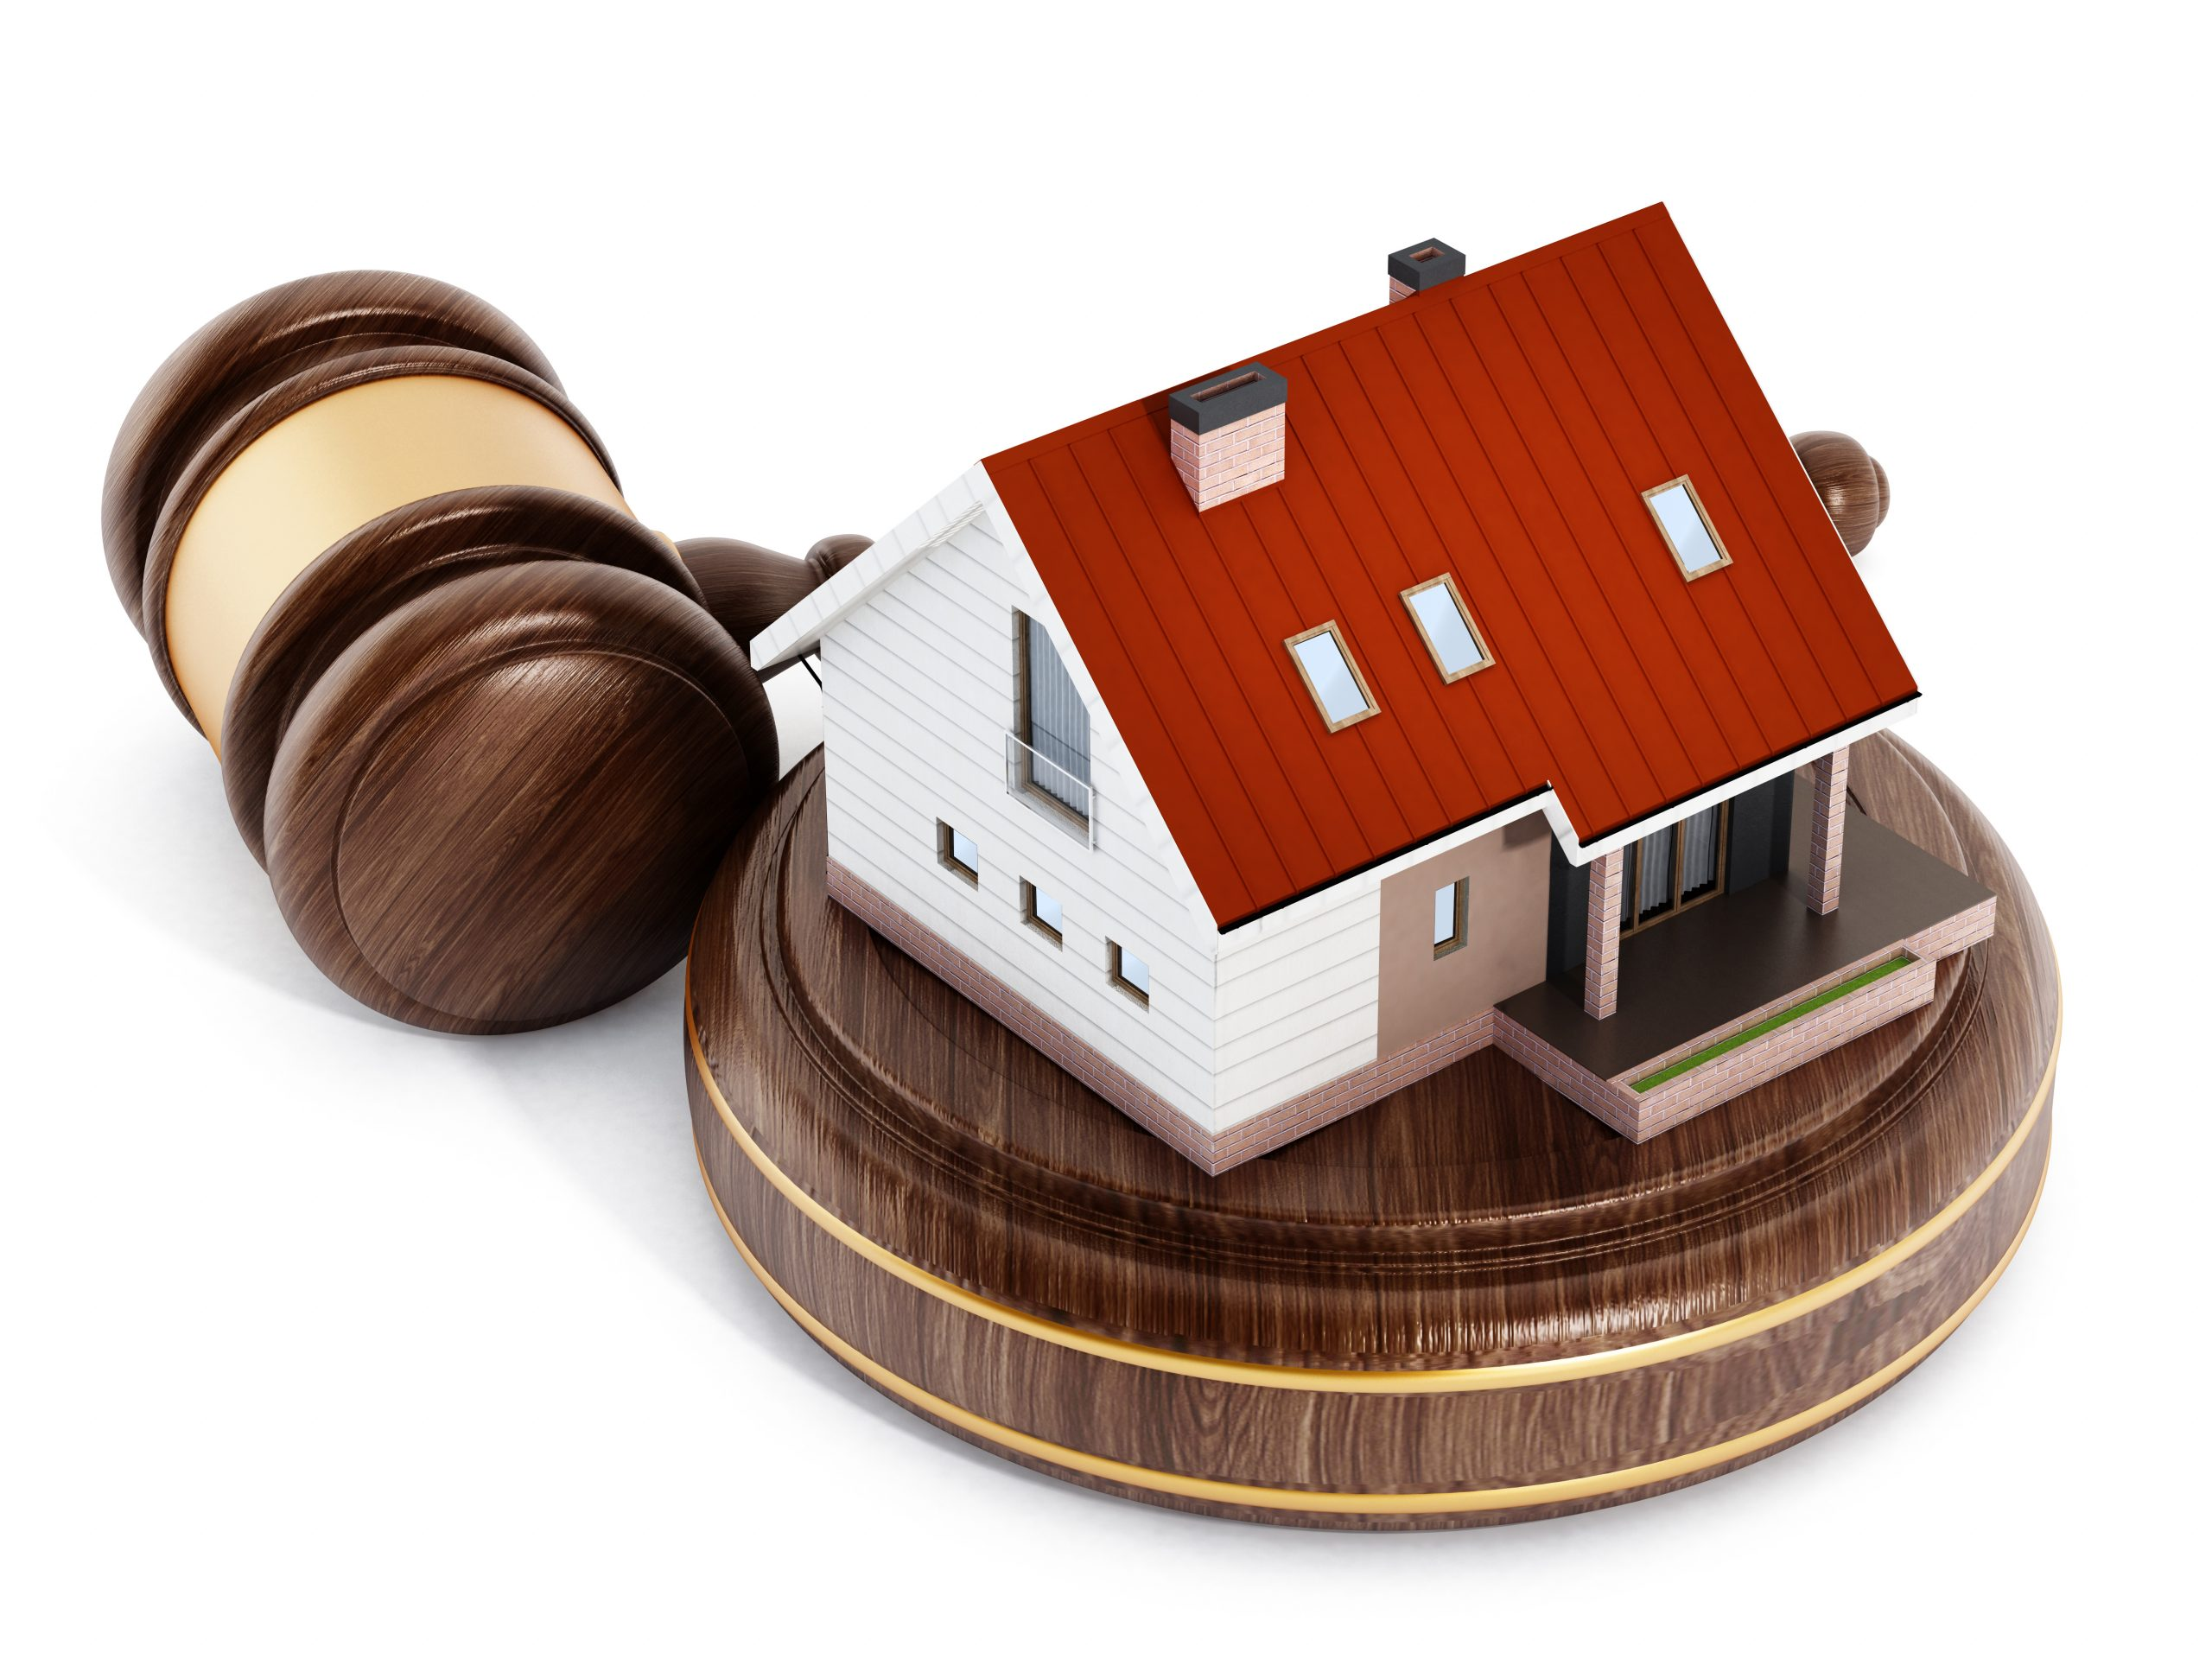 House under a wooden gavel. 3D illustration.